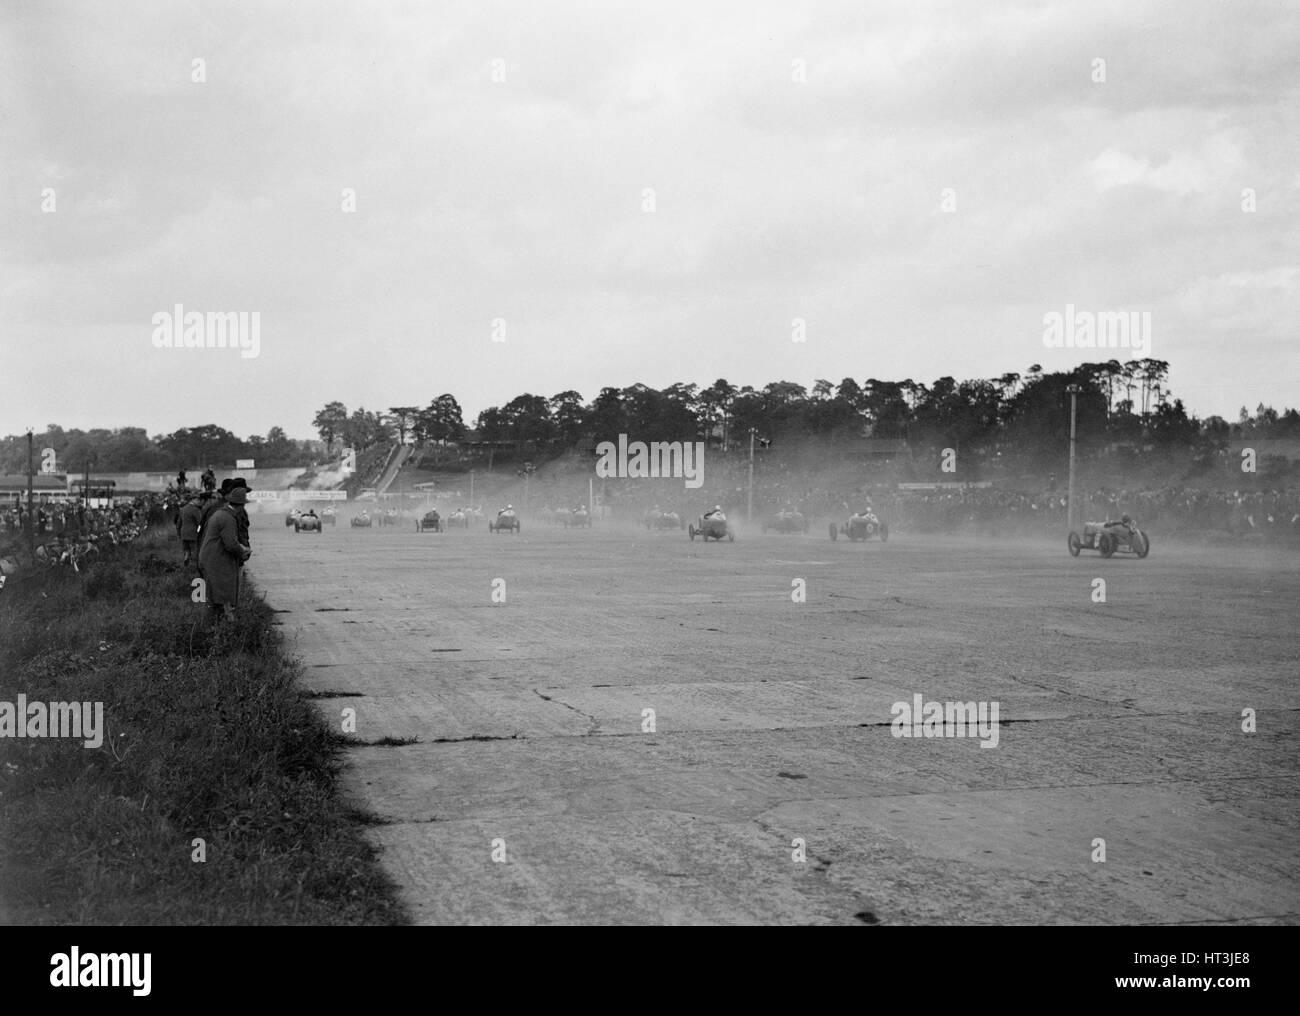 JCC 200 Mile Race, Brooklands, 1920s. Artist: Bill Brunell. - Stock Image